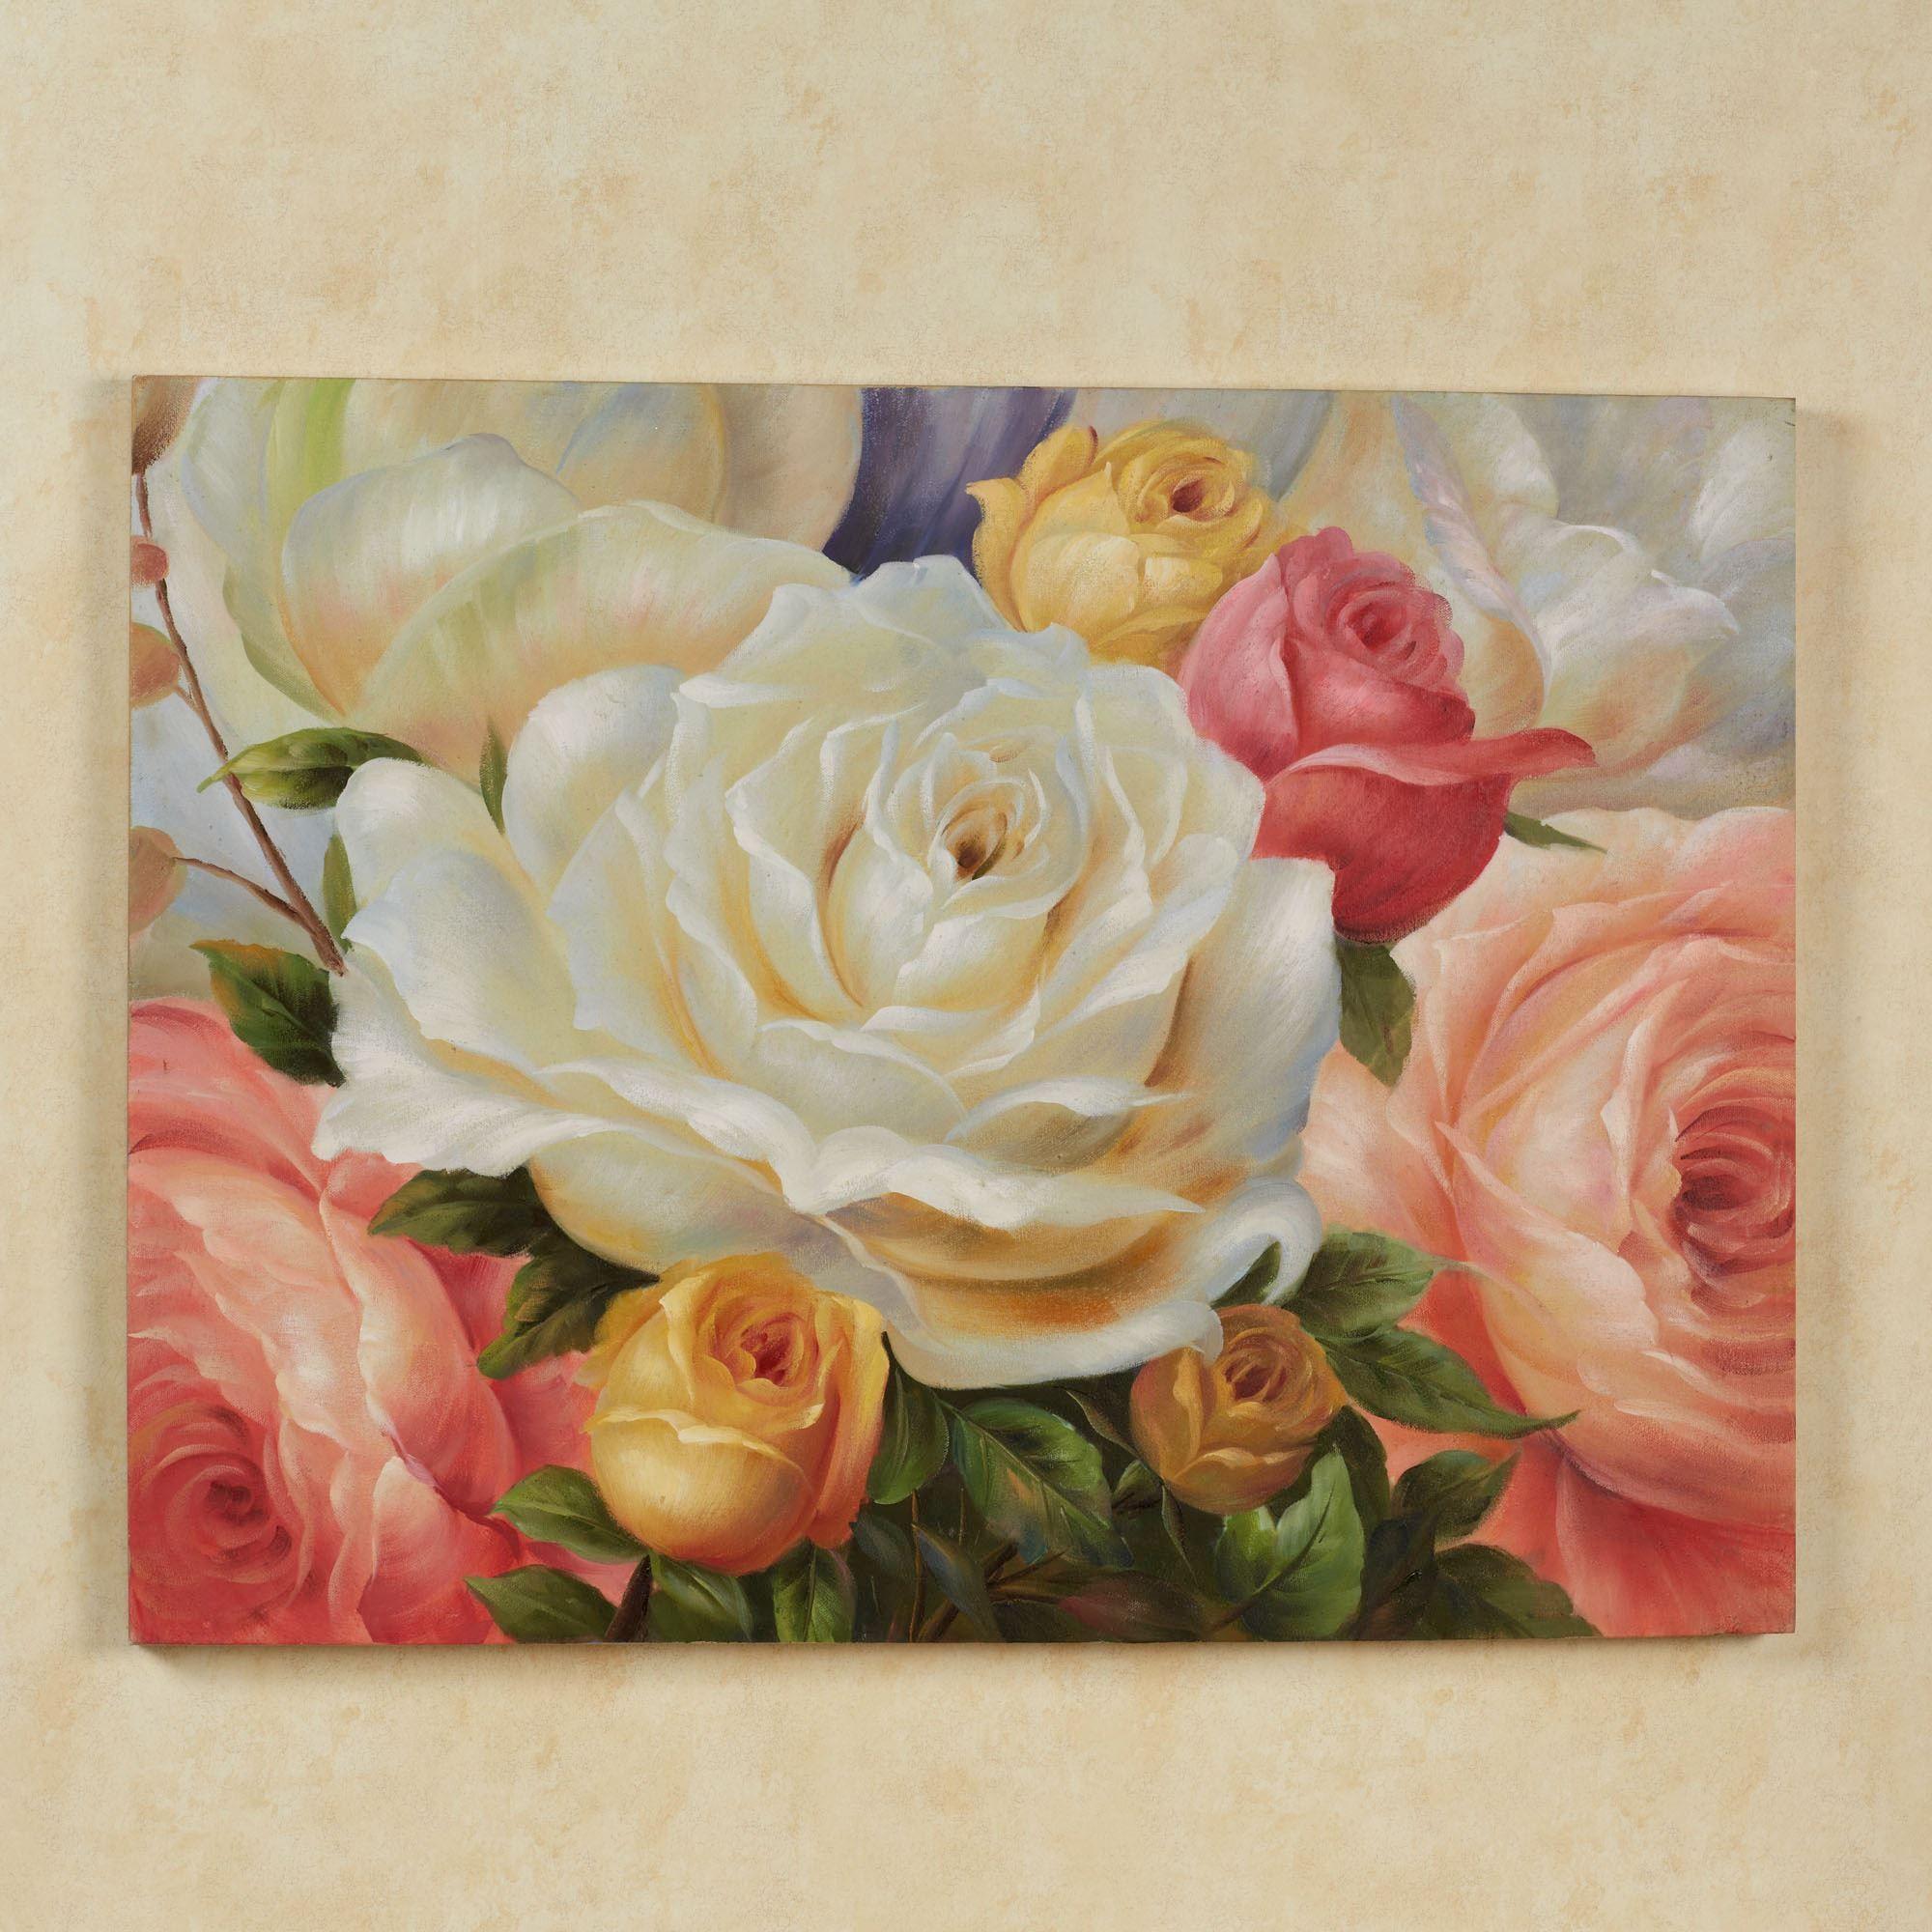 Rose Garden Handpainted Floral Canvas Wall Art